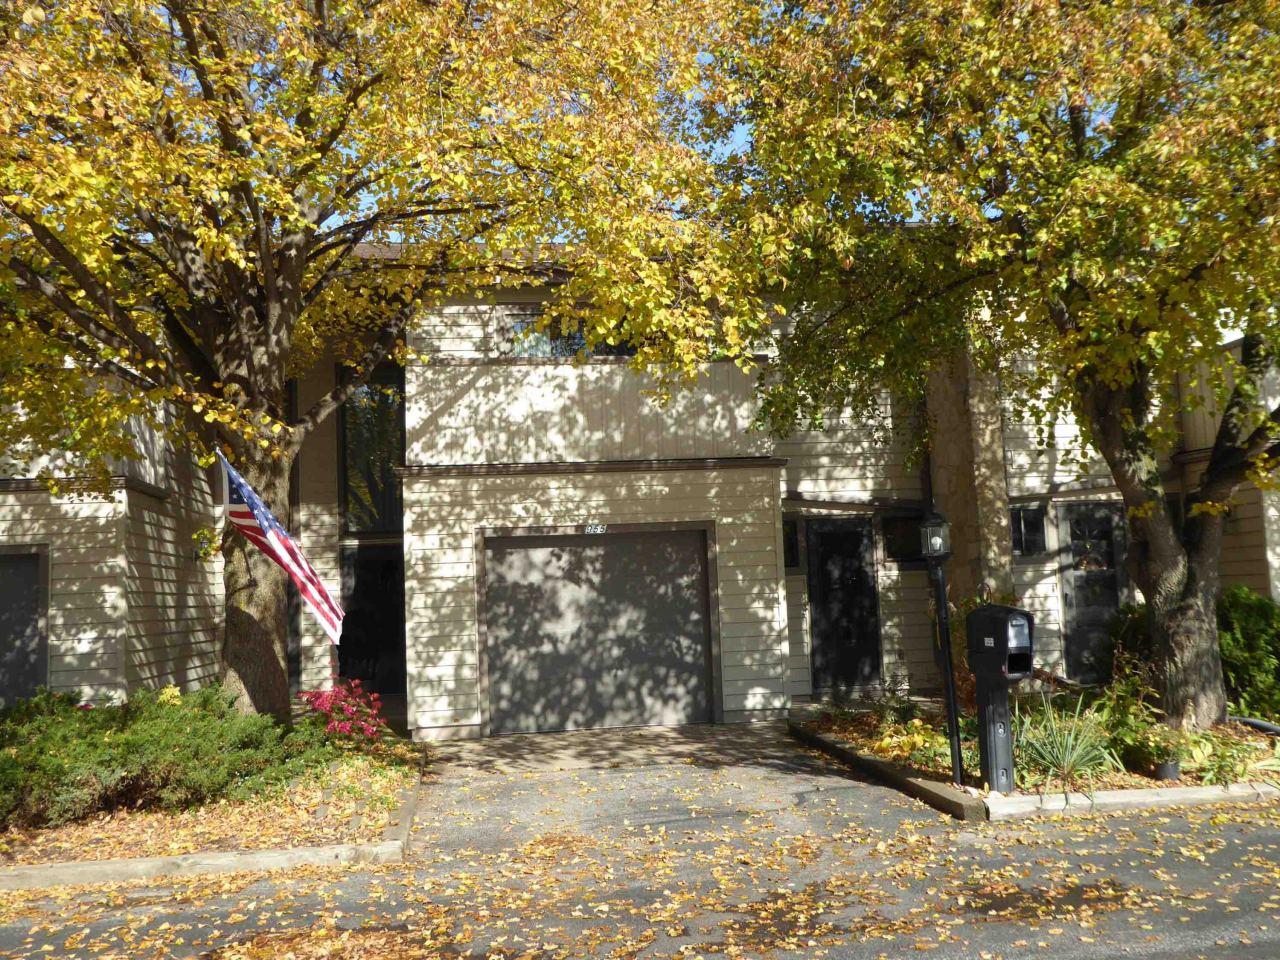 955 Armour Rd, Oconomowoc, Wisconsin 53066, 3 Bedrooms Bedrooms, 6 Rooms Rooms,1 BathroomBathrooms,Condominiums,For Sale,Armour Rd,1,1665651